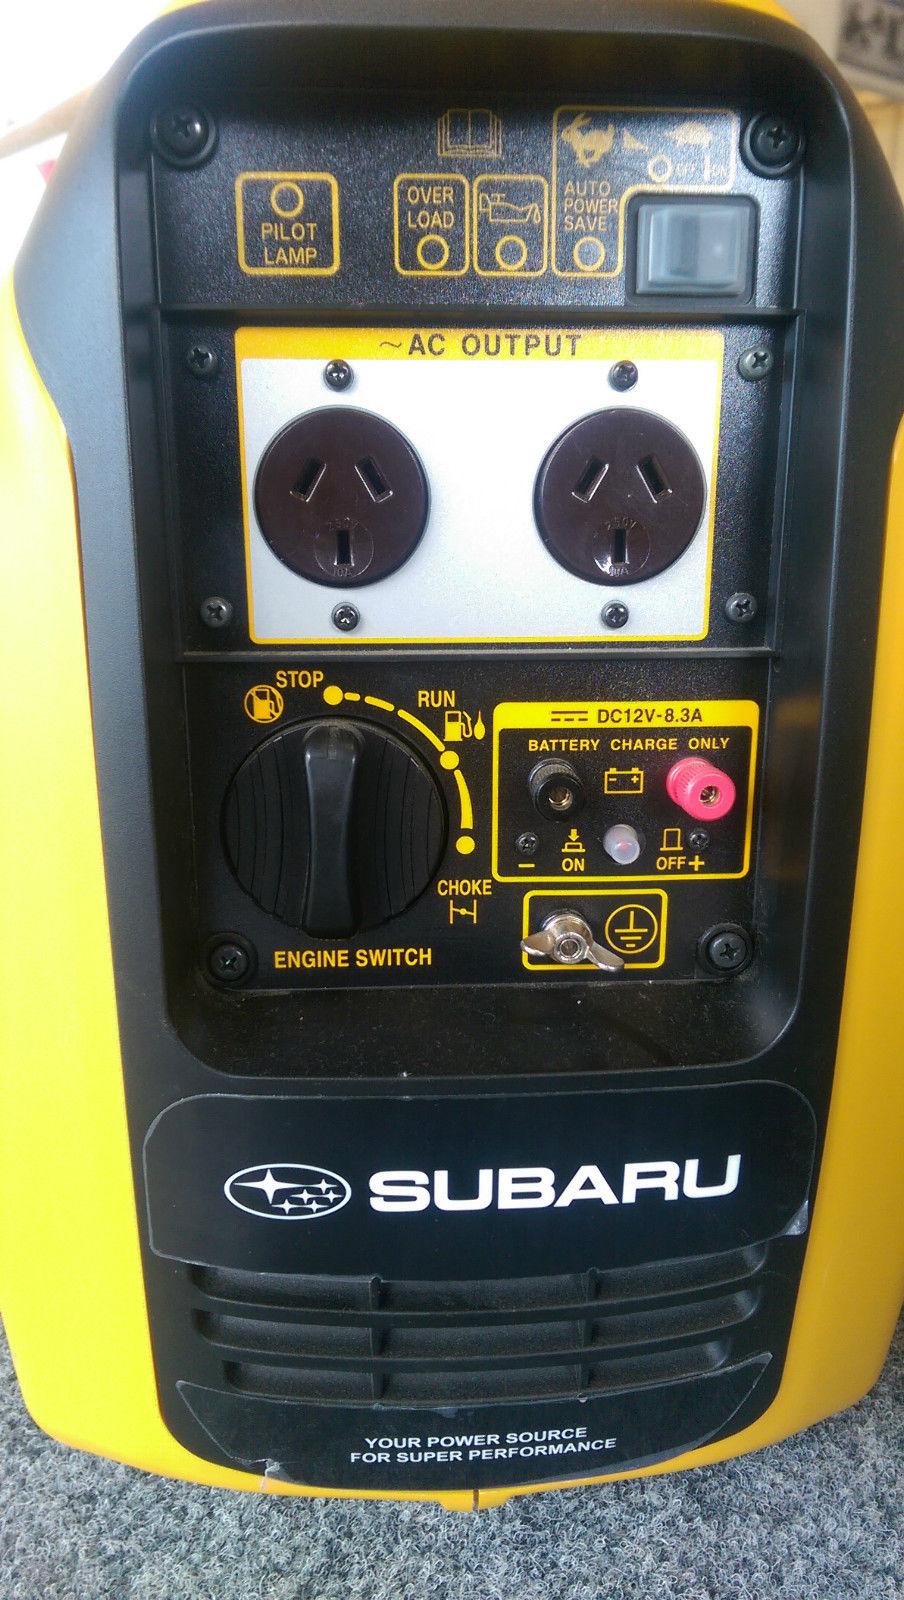 Subaru R1700i 1 65kva Portable Inverter Generator